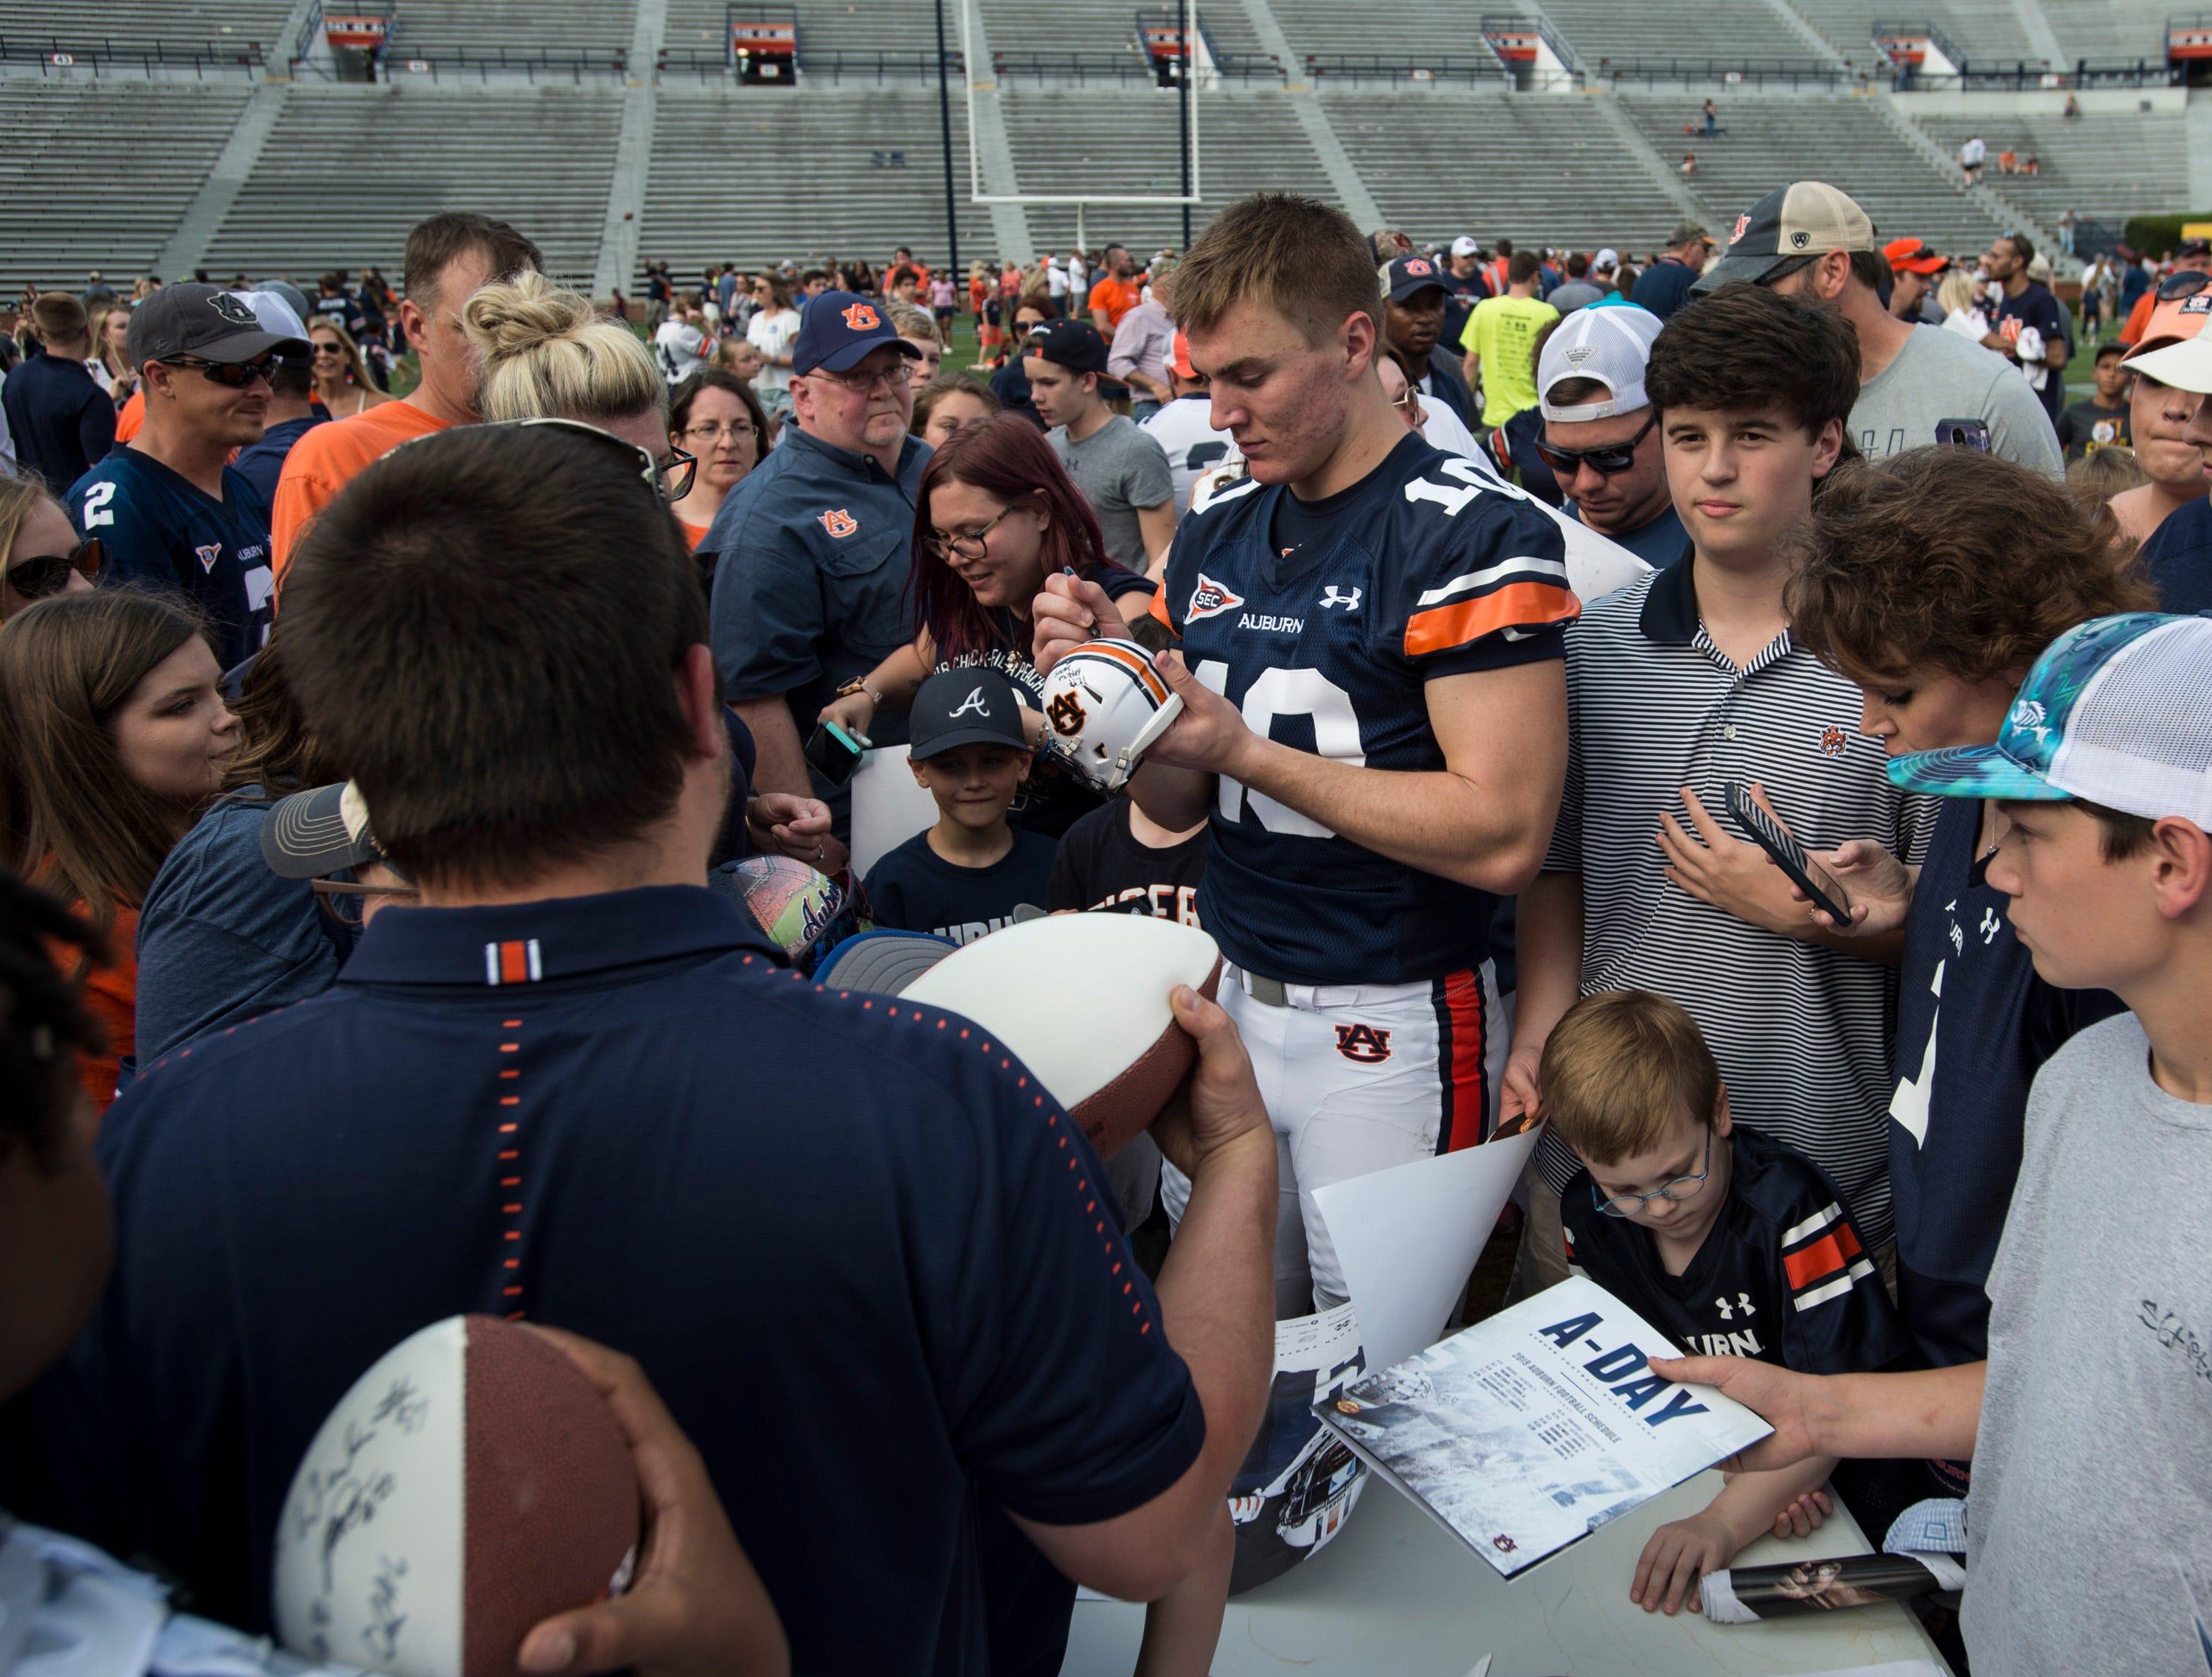 Auburn quarterback Bo Nix (10) signs autographs during the A-Day spring practice gameat Jordan-Hare Stadium in Auburn, Ala., on Saturday, April 13, 2019.